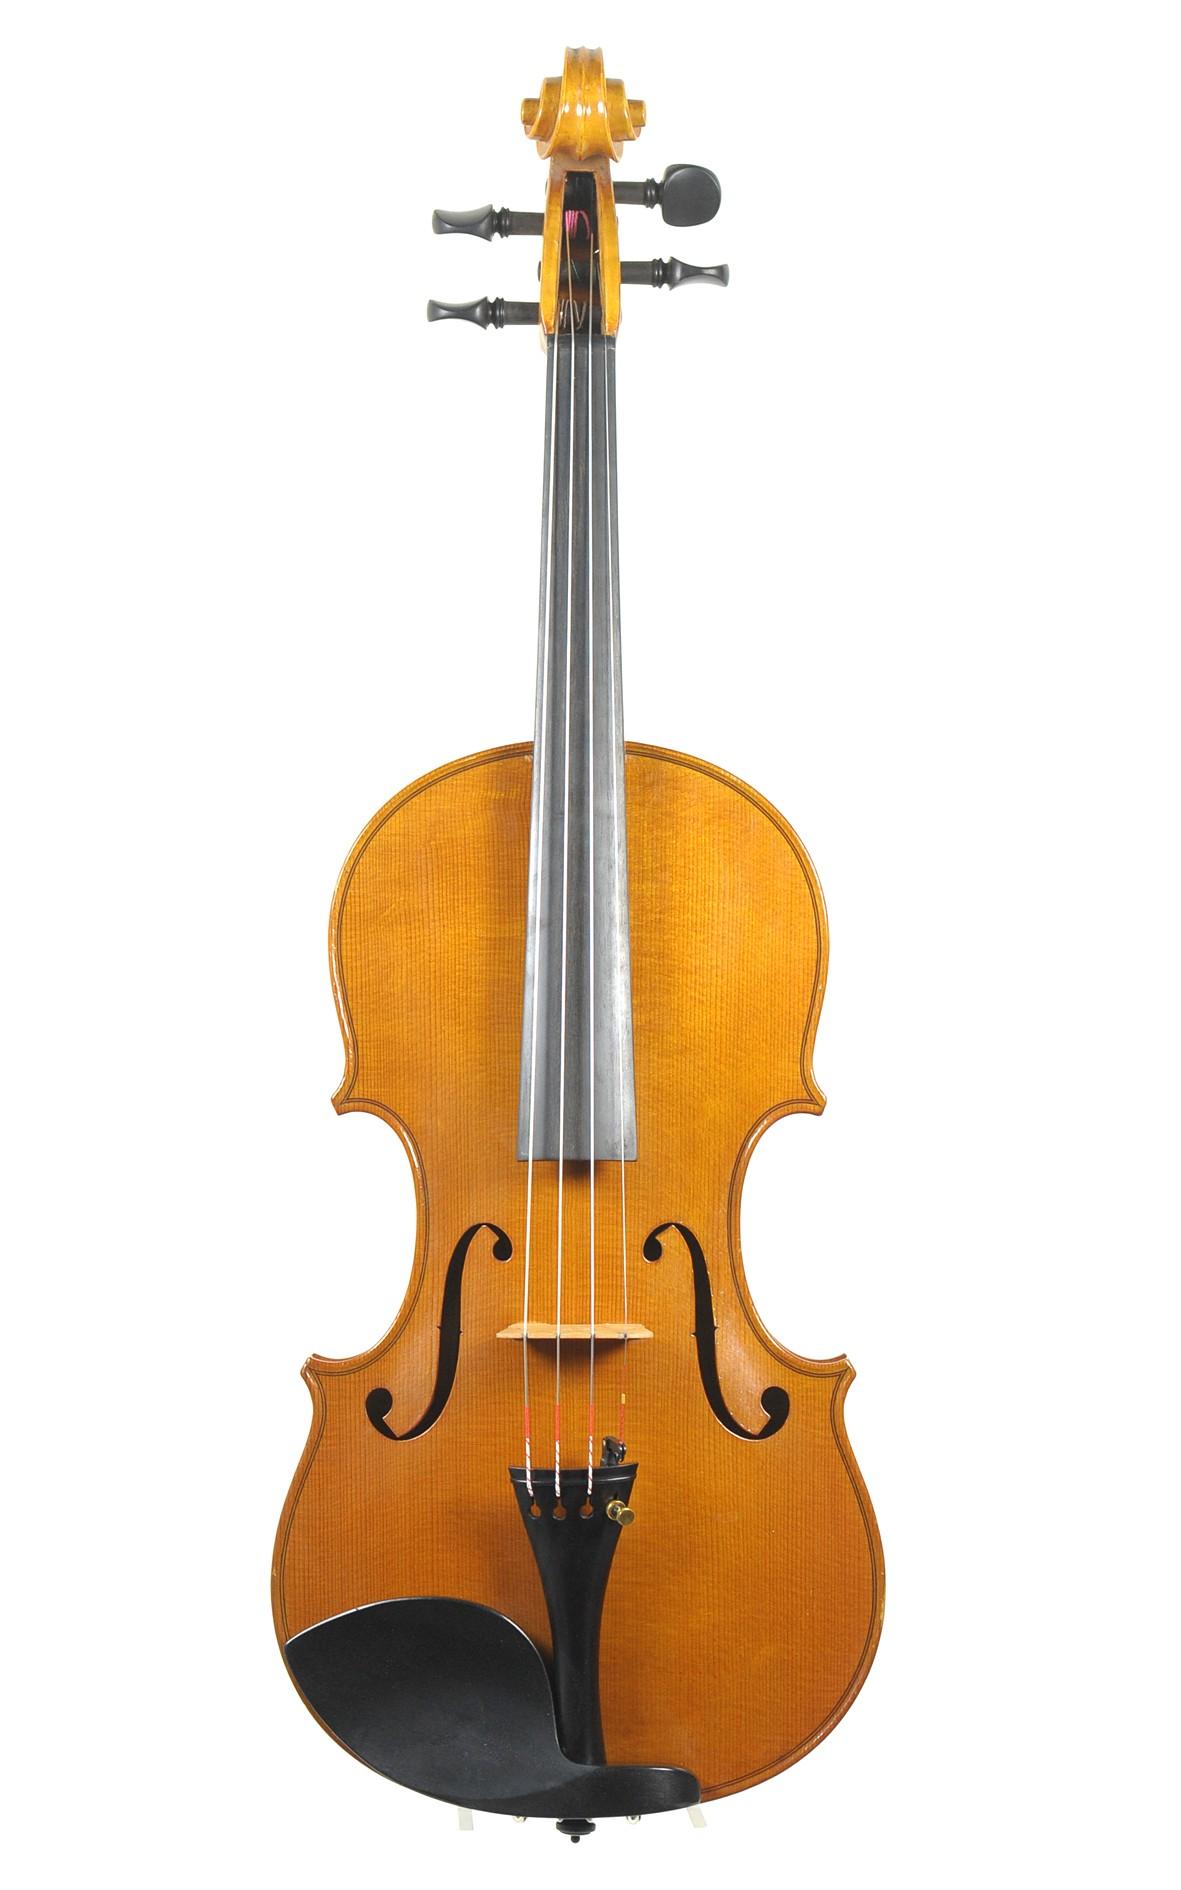 Jacques Camurat, 1958: A French Paris master violin - top